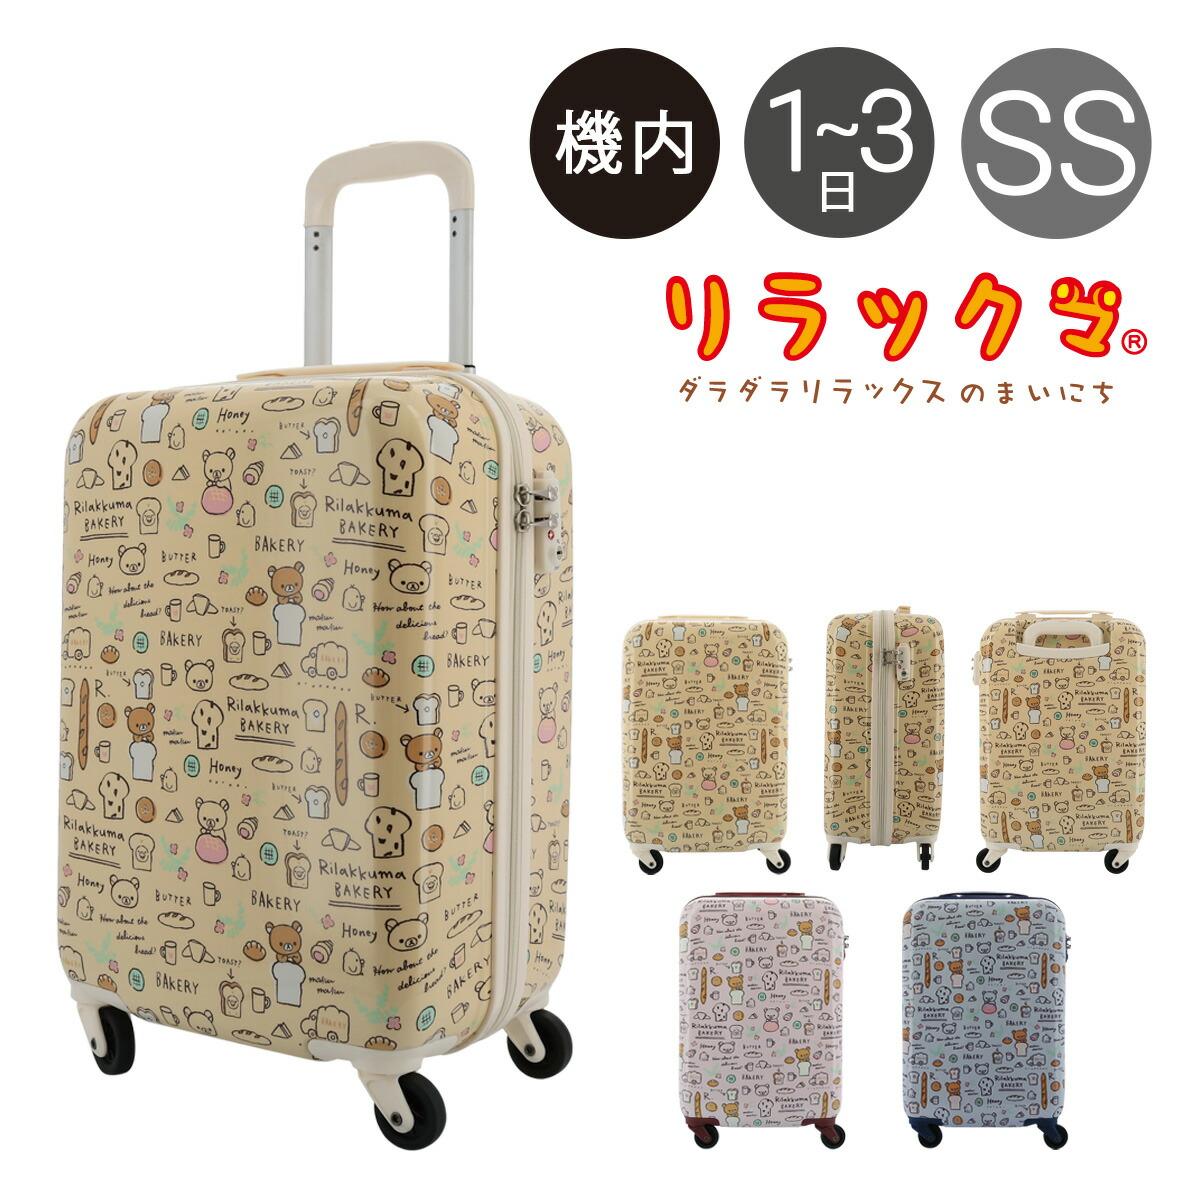 8ea41c1881 リラックマ スーツケース 31L 47cm 2RK0-47H Rilakkuma | キャリーケース ハードキャリー TSAロック搭載 機内持ち込み可  の通販 | SAC'S BAR サックスバー